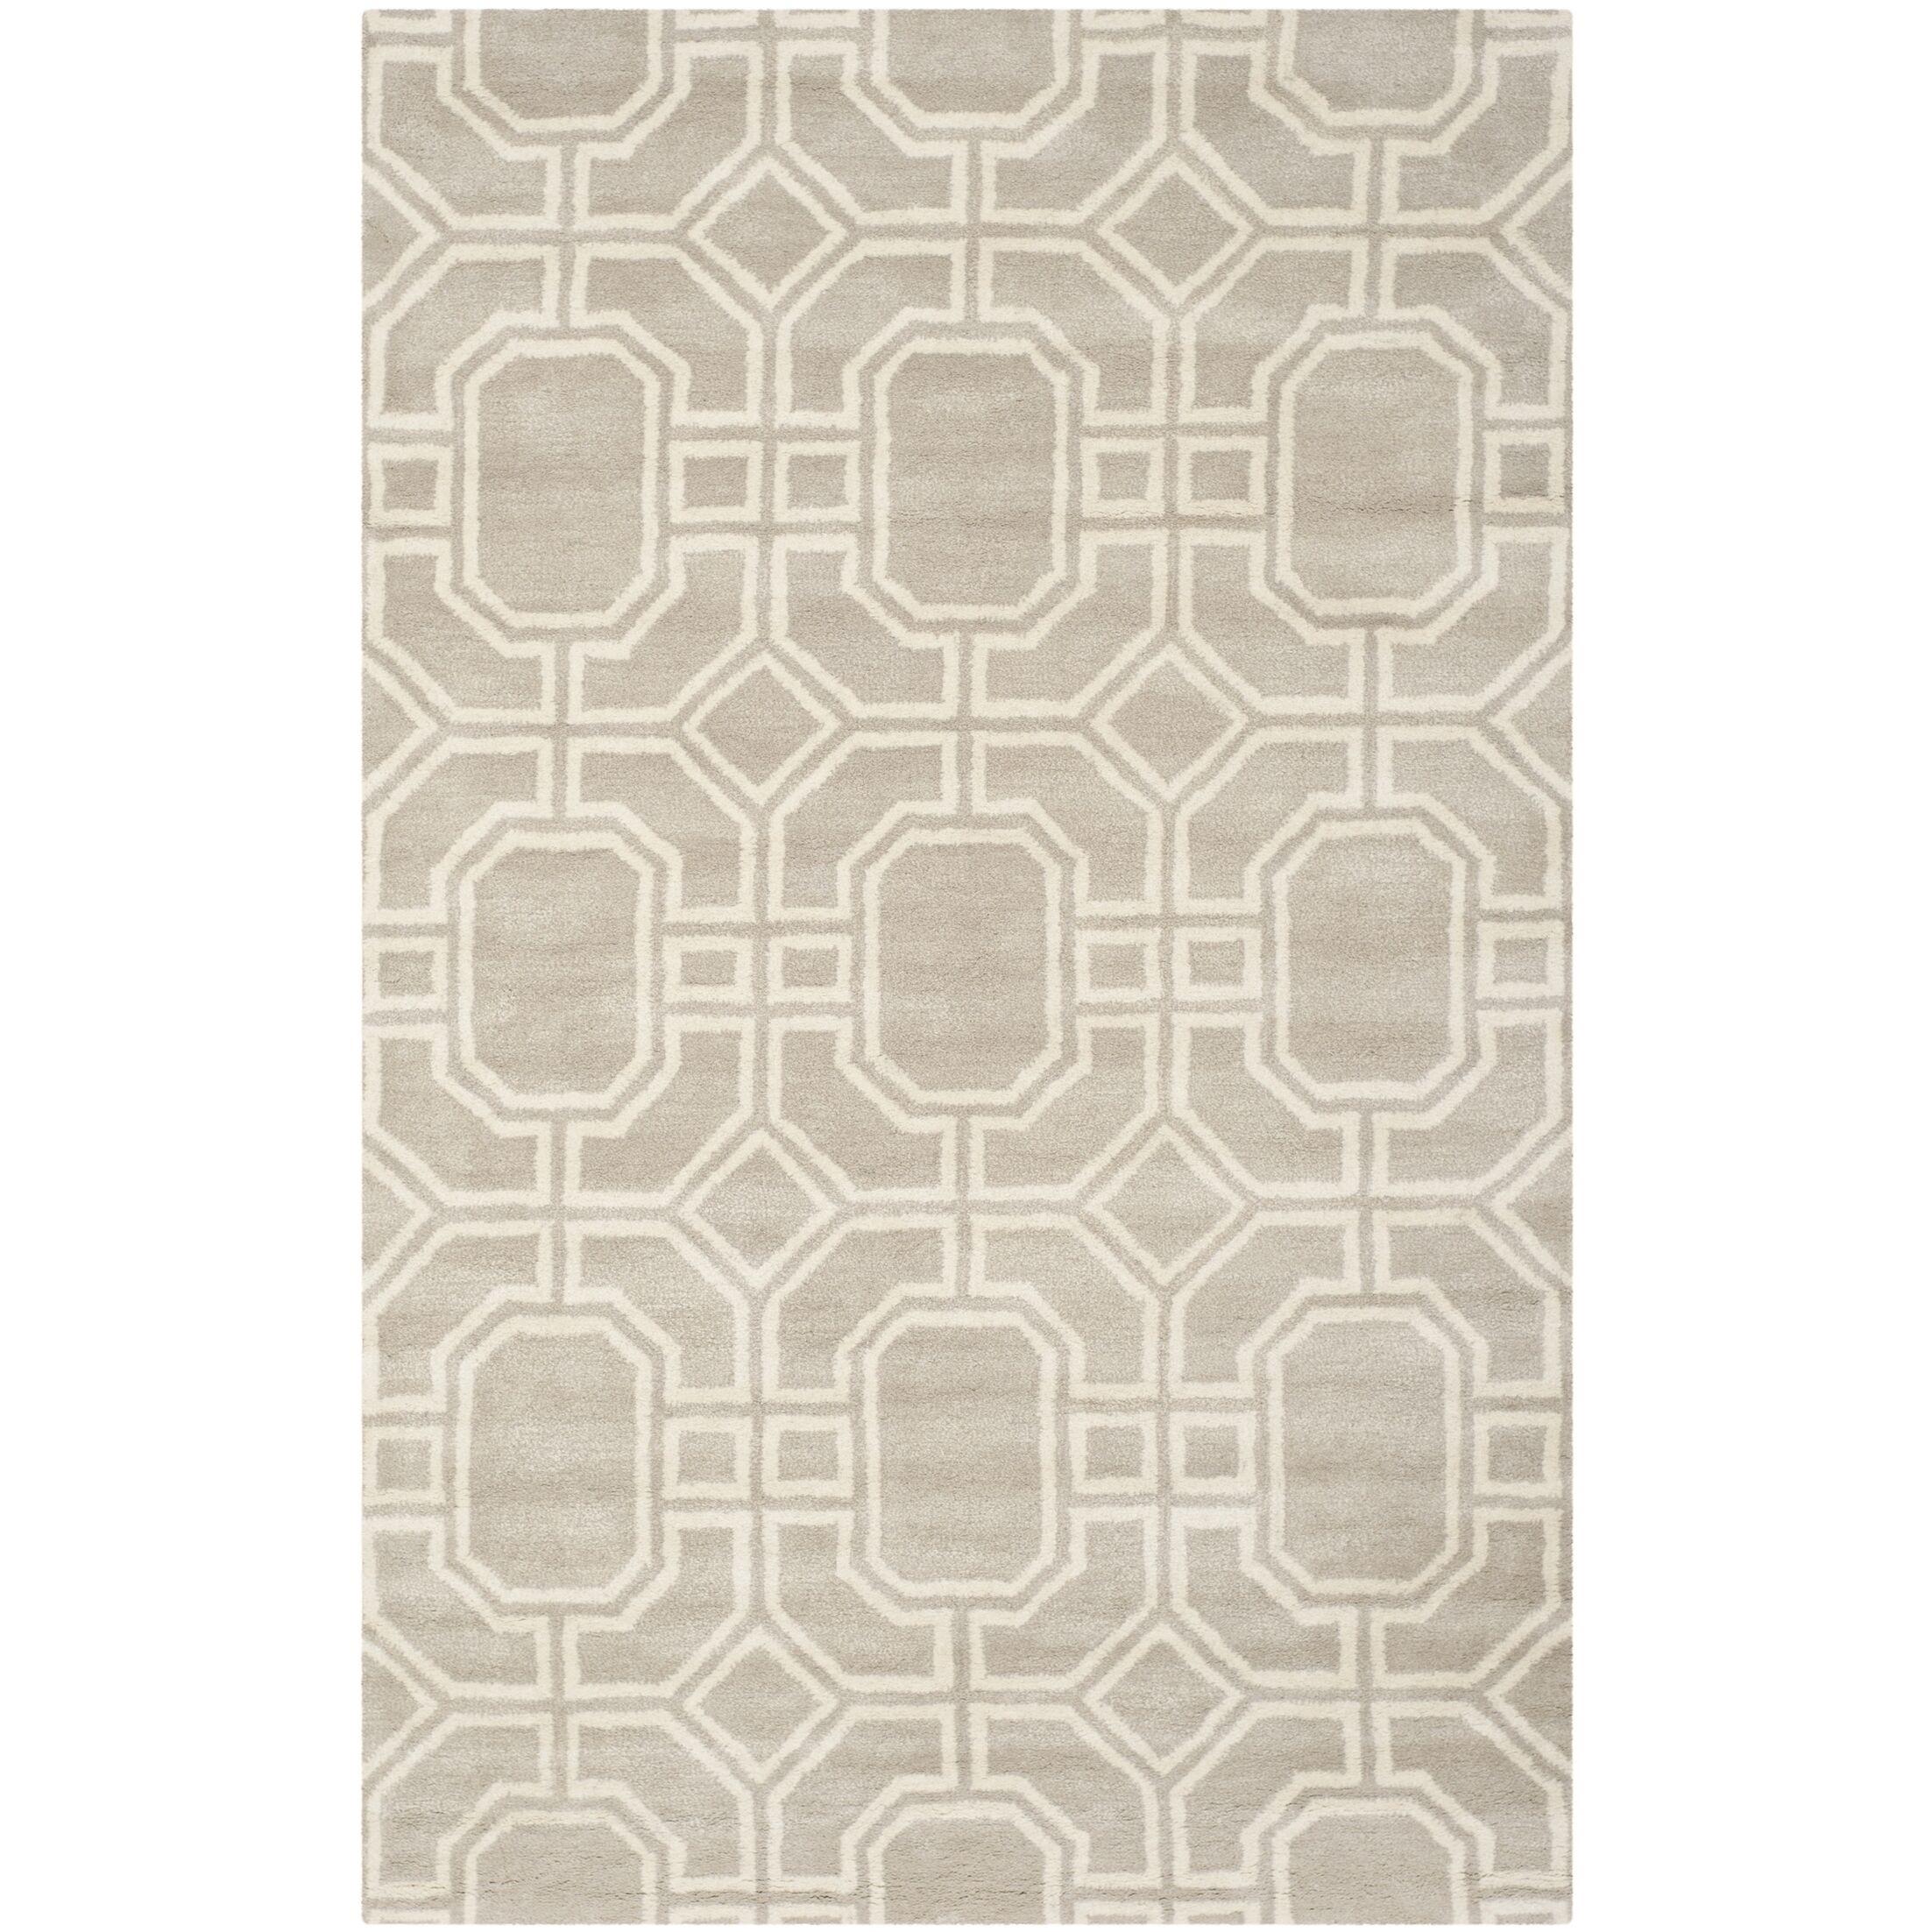 Schaub Hand-Tufted Gray/Ivory Area Rug Rug Size: Rectangle 3'6